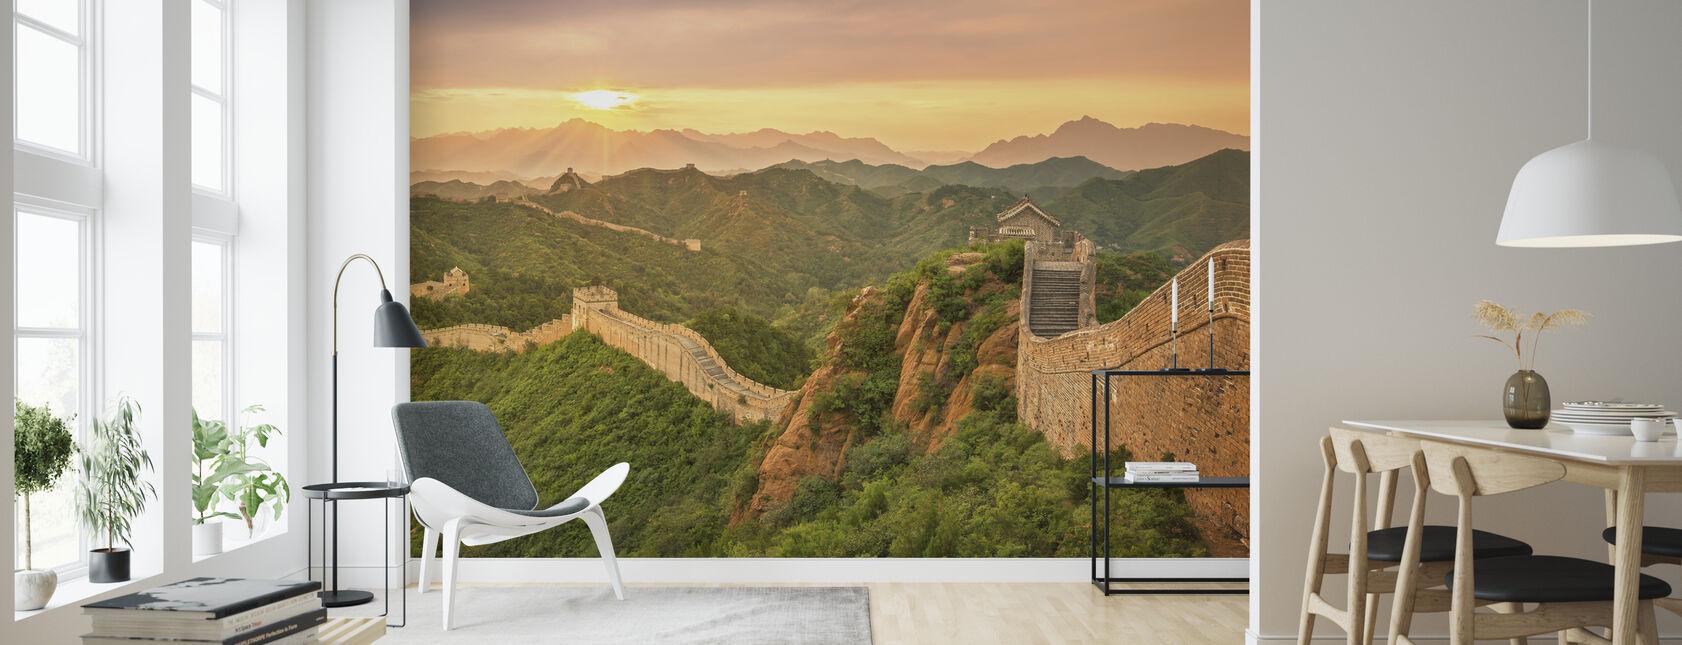 Great Wall of China at Sunrise - Wallpaper - Living Room